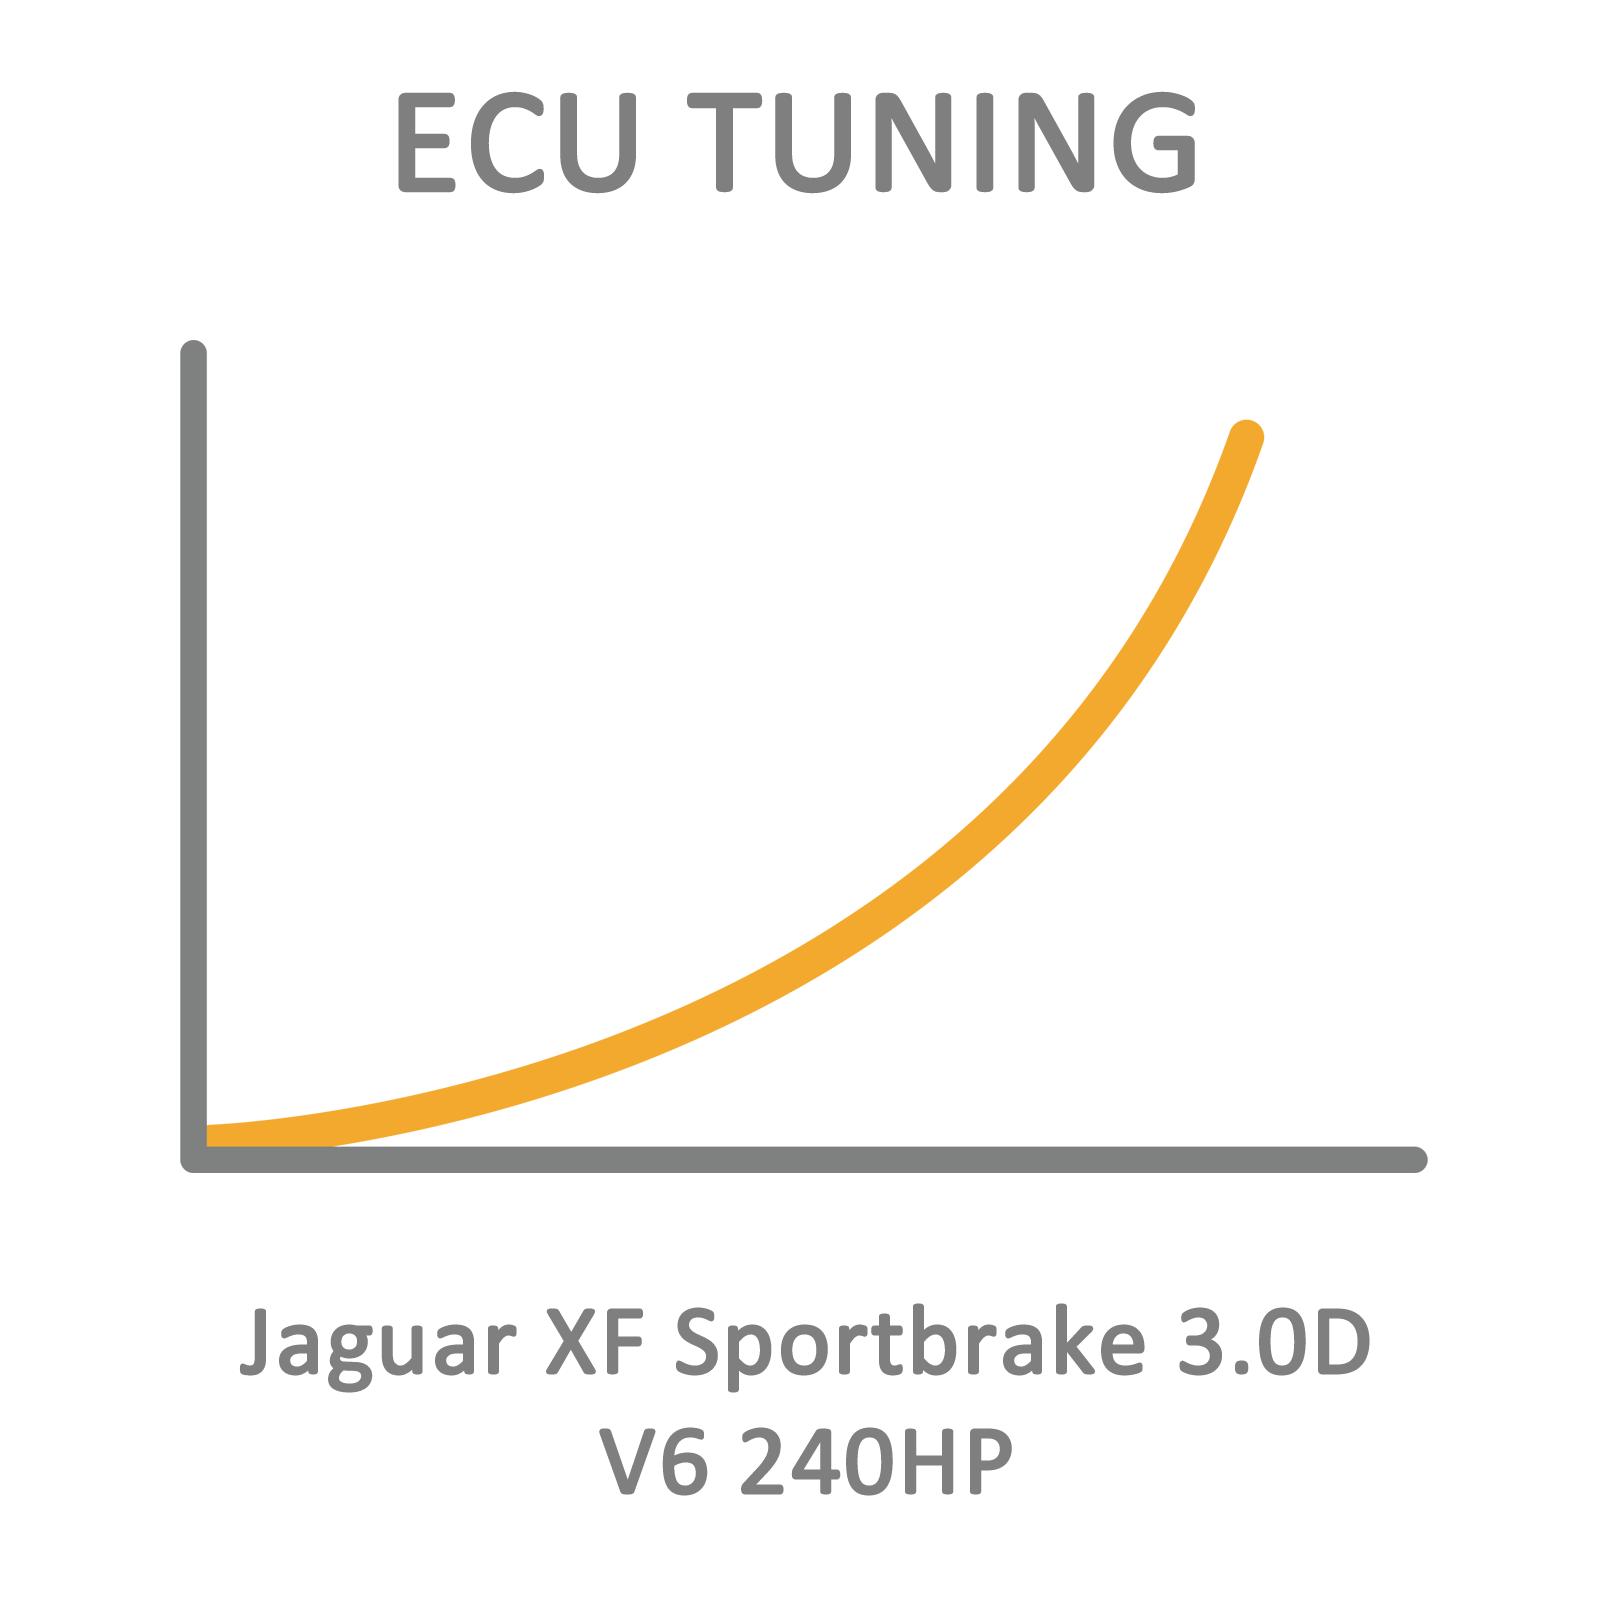 Jaguar XF Sportbrake 3.0D V6 240HP ECU Tuning Remapping